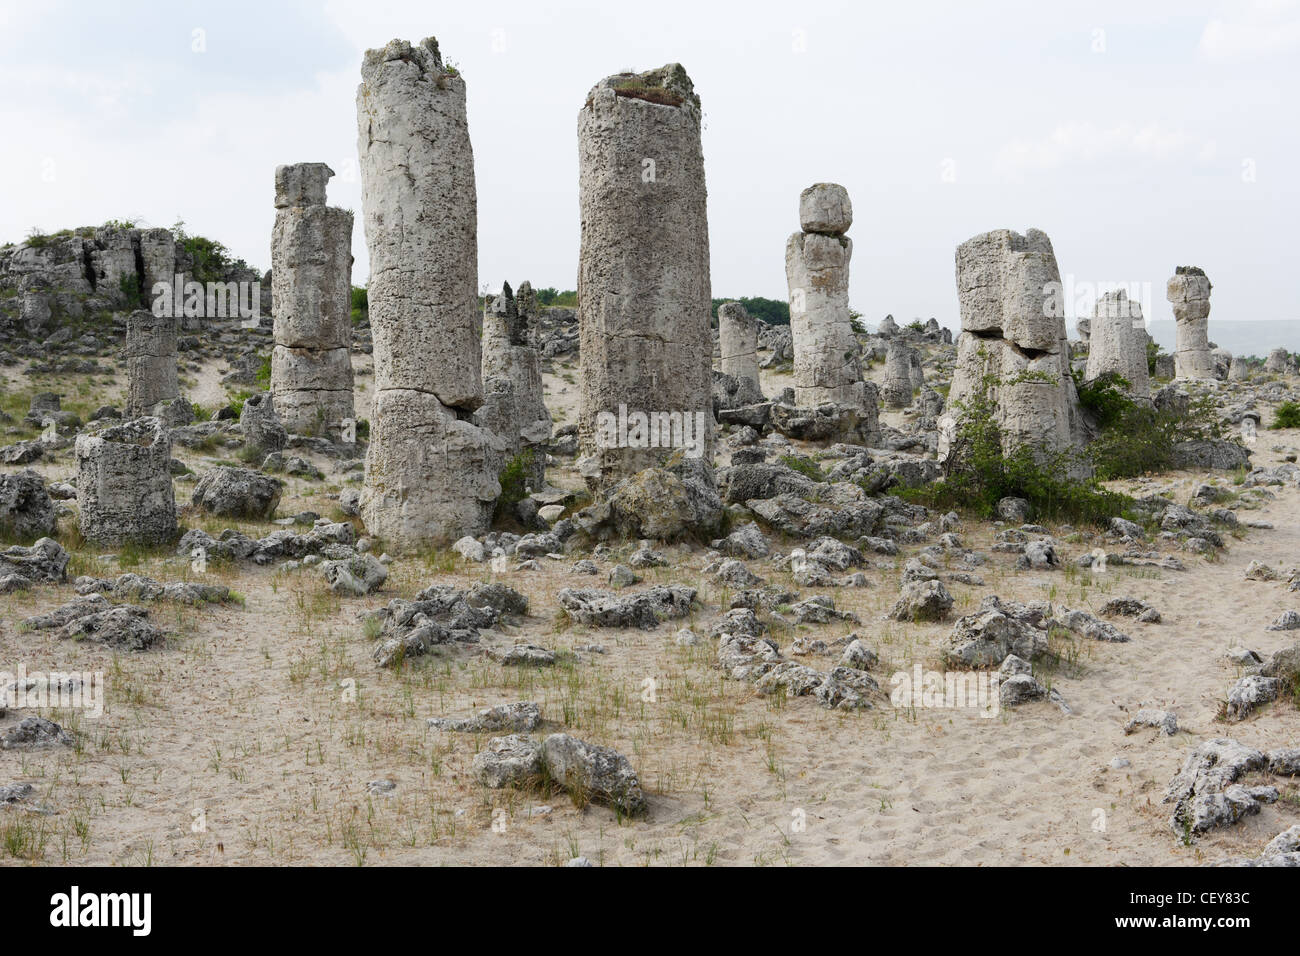 Stone phenomenon near Varna city, Bulgaria - Stock Image